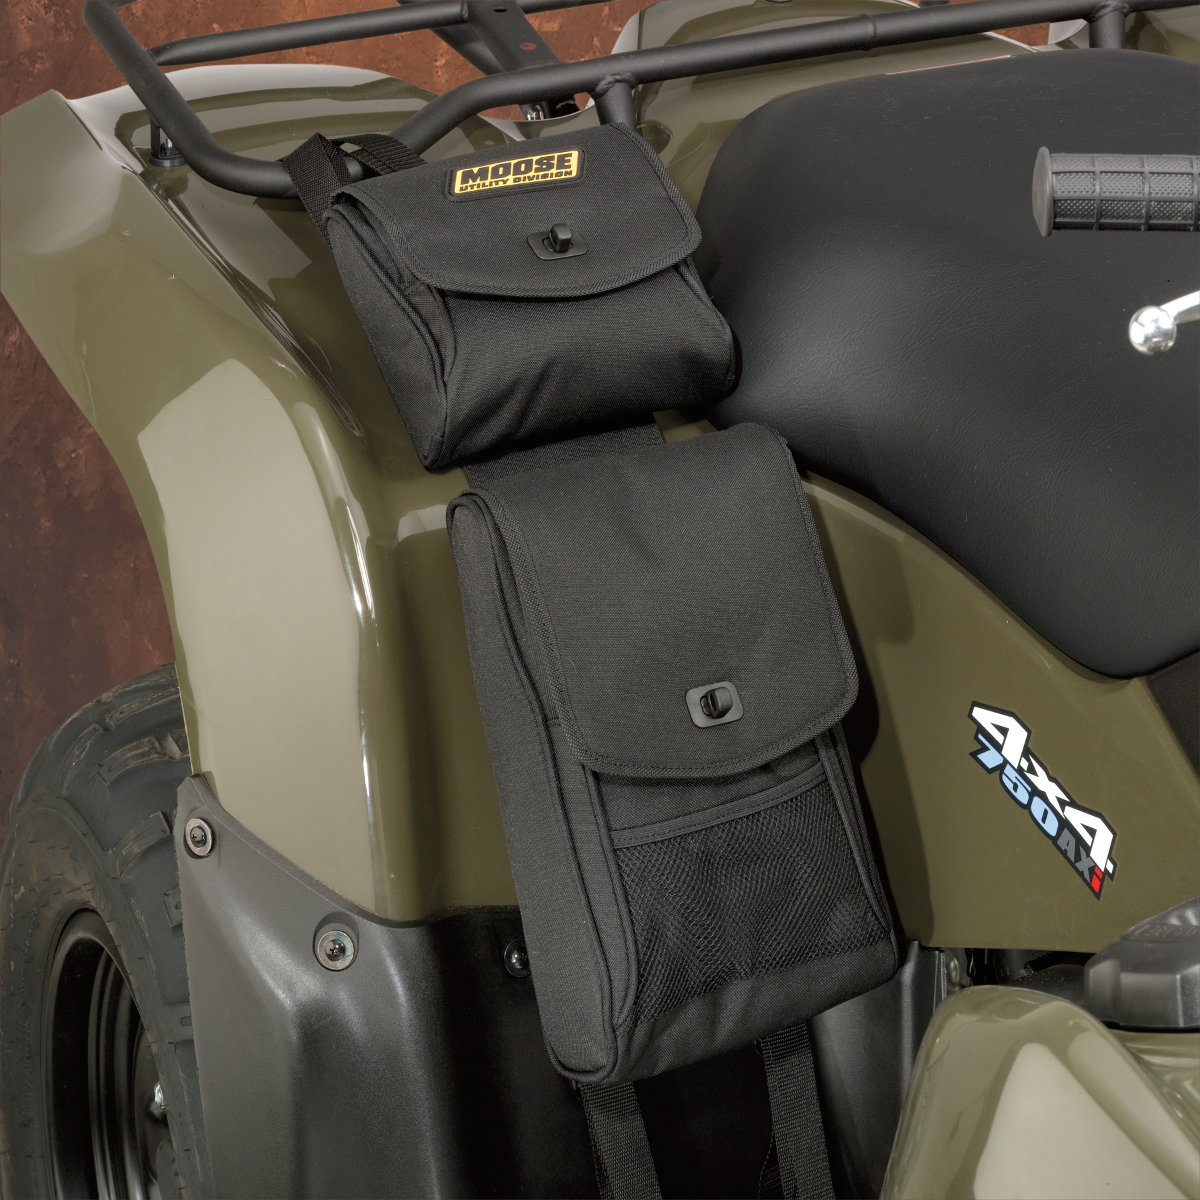 Moose ATV Fender Storage Cargo Bag Black (3509-0024)